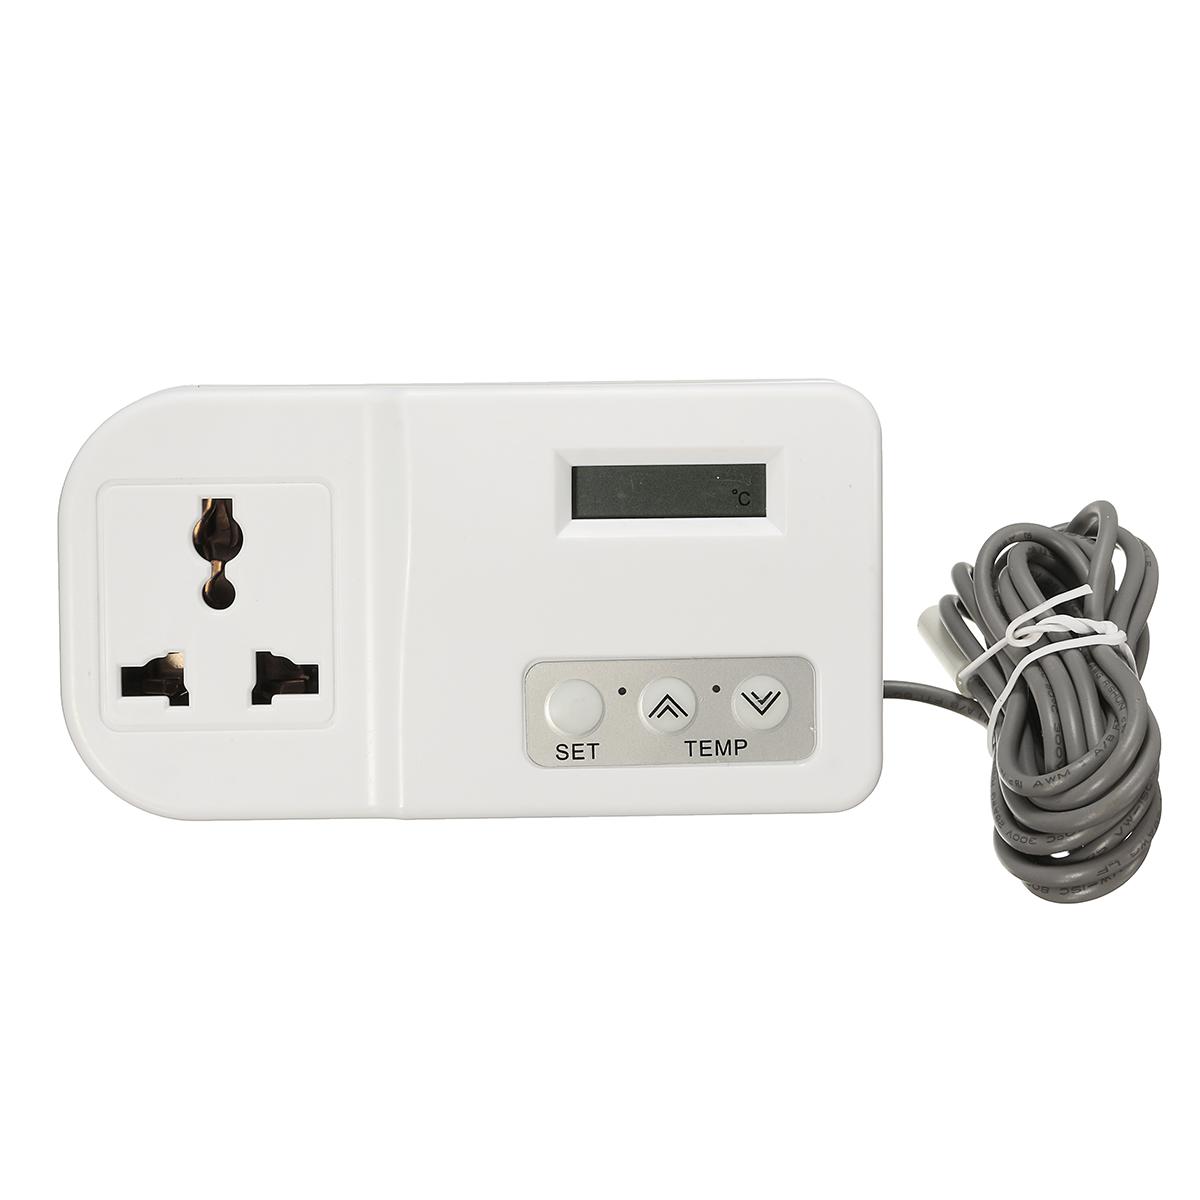 Kulkas termostat Digital pengontrol suhu untuk akuarium rumah kaca Inggris - International